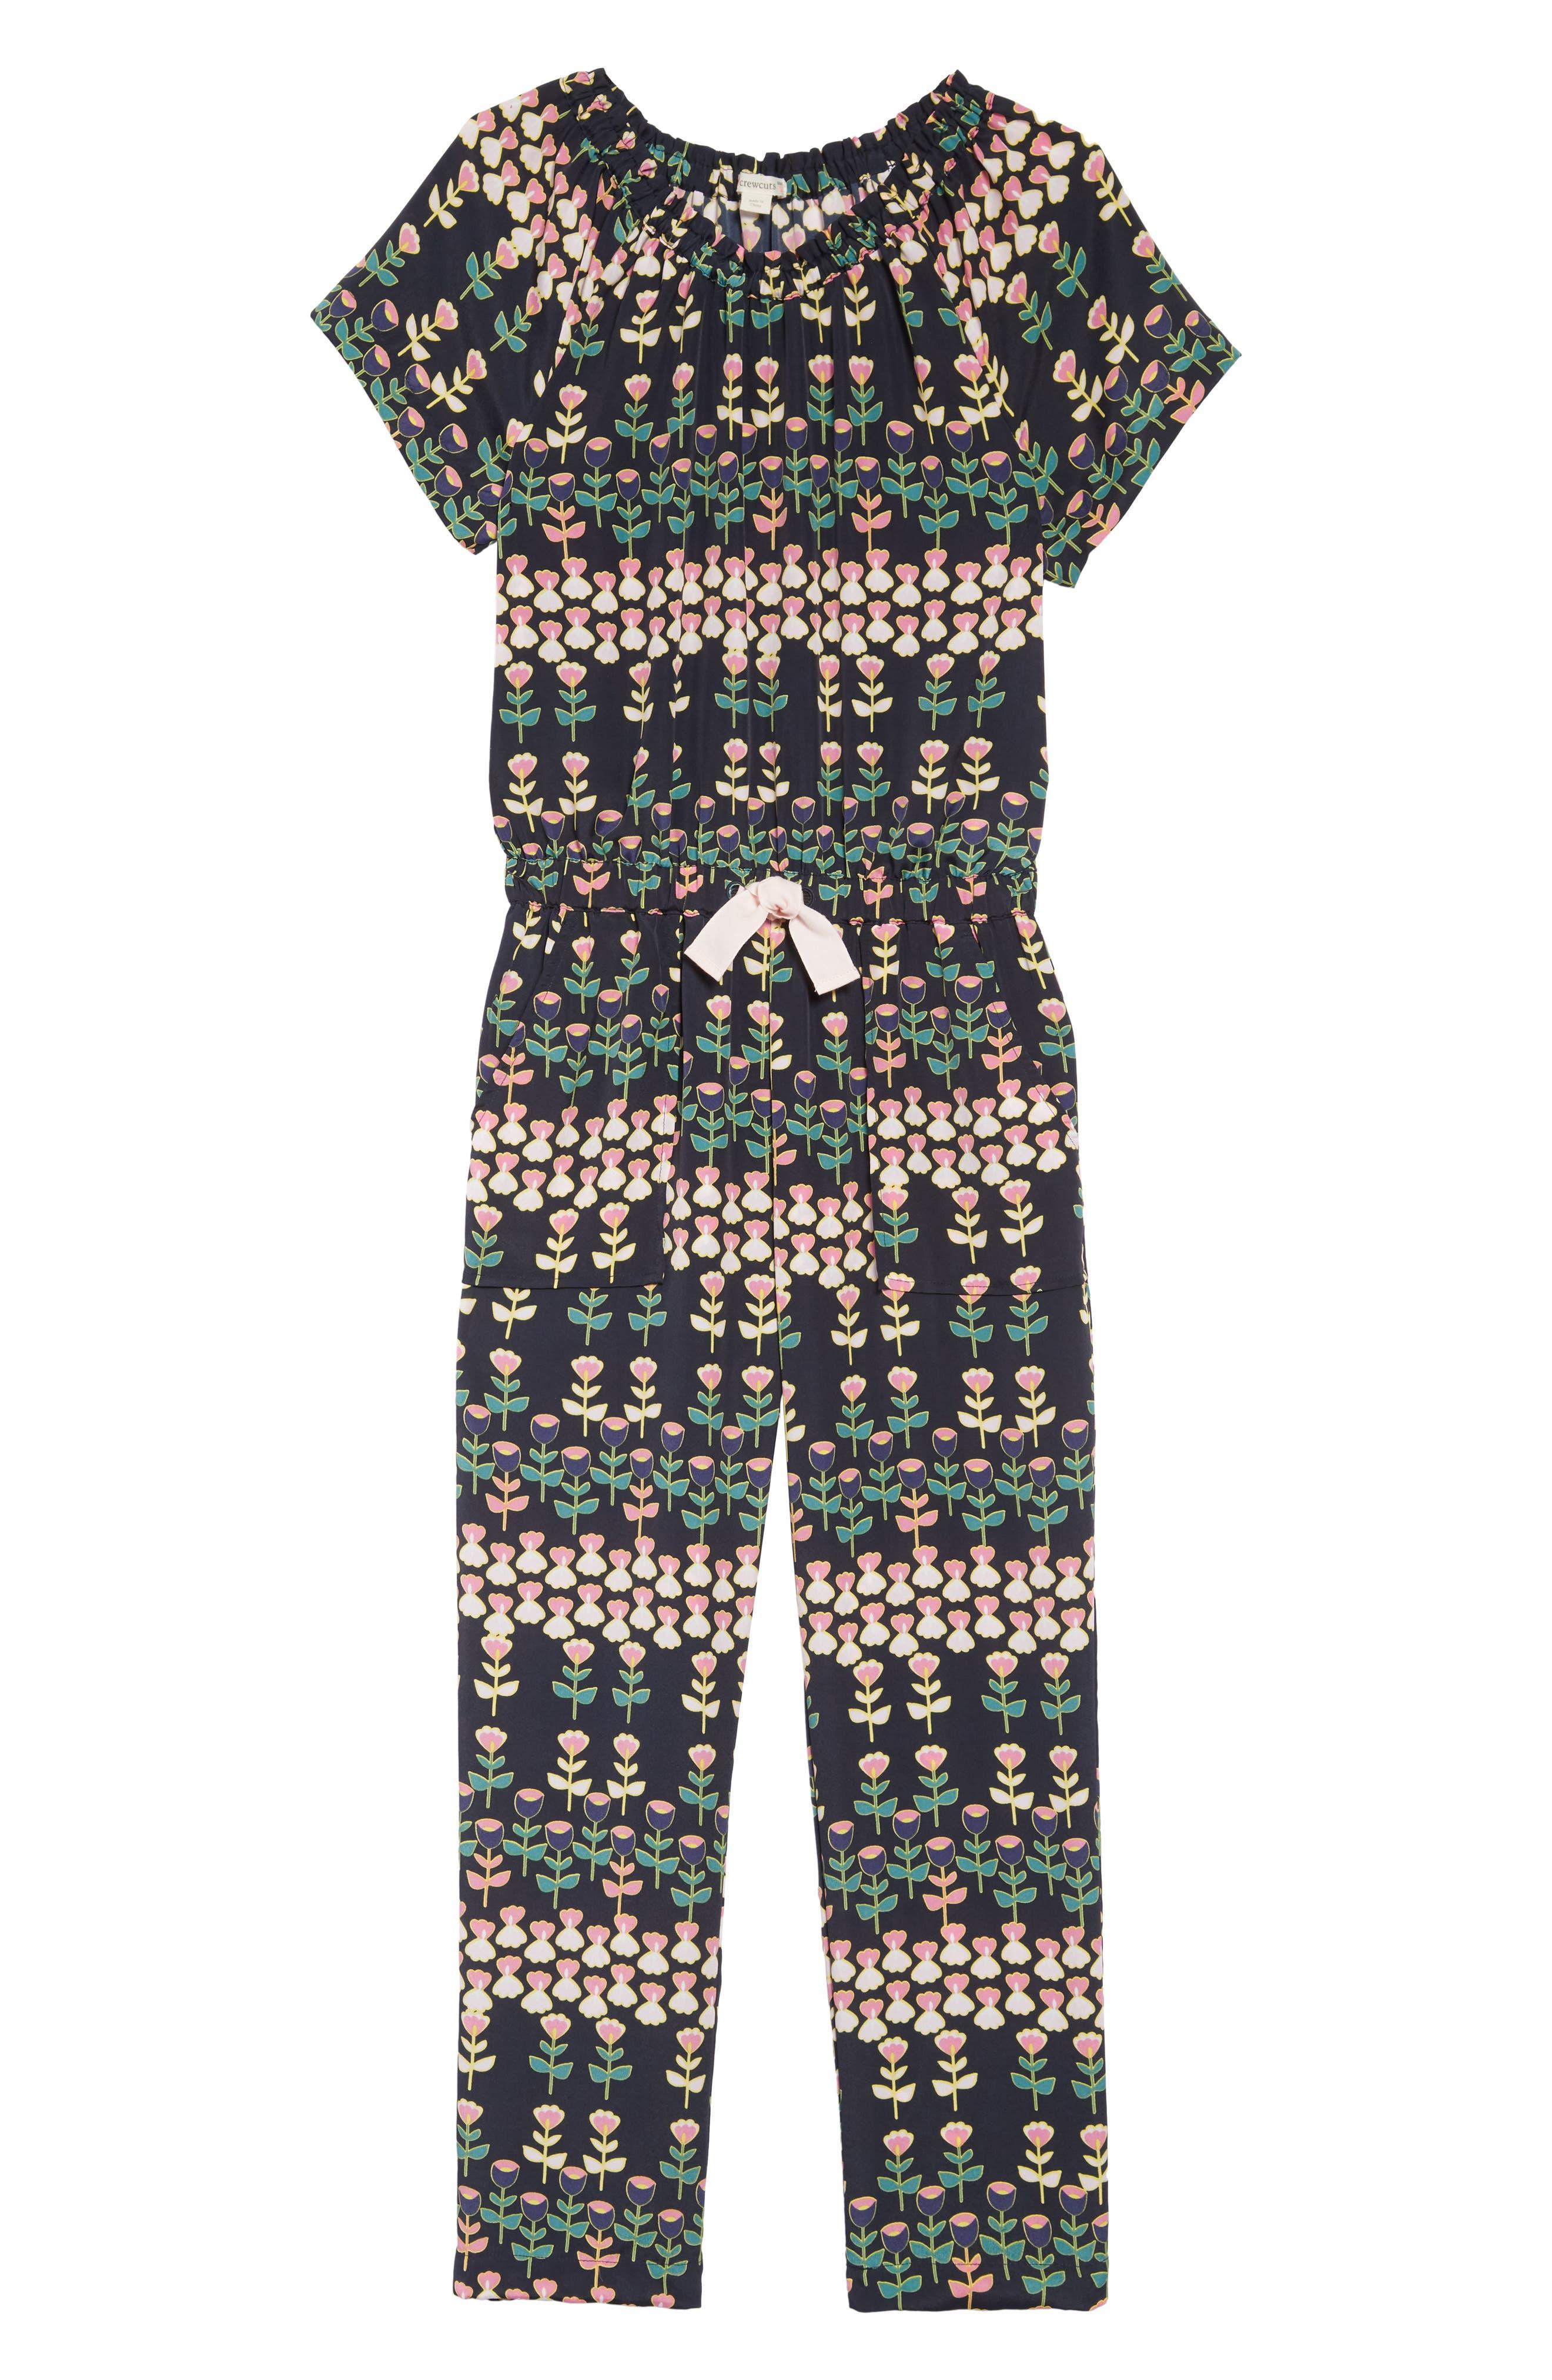 CREWCUTS BY J.CREW, Naomi Floral Print Jumpsuit, Main thumbnail 1, color, 411